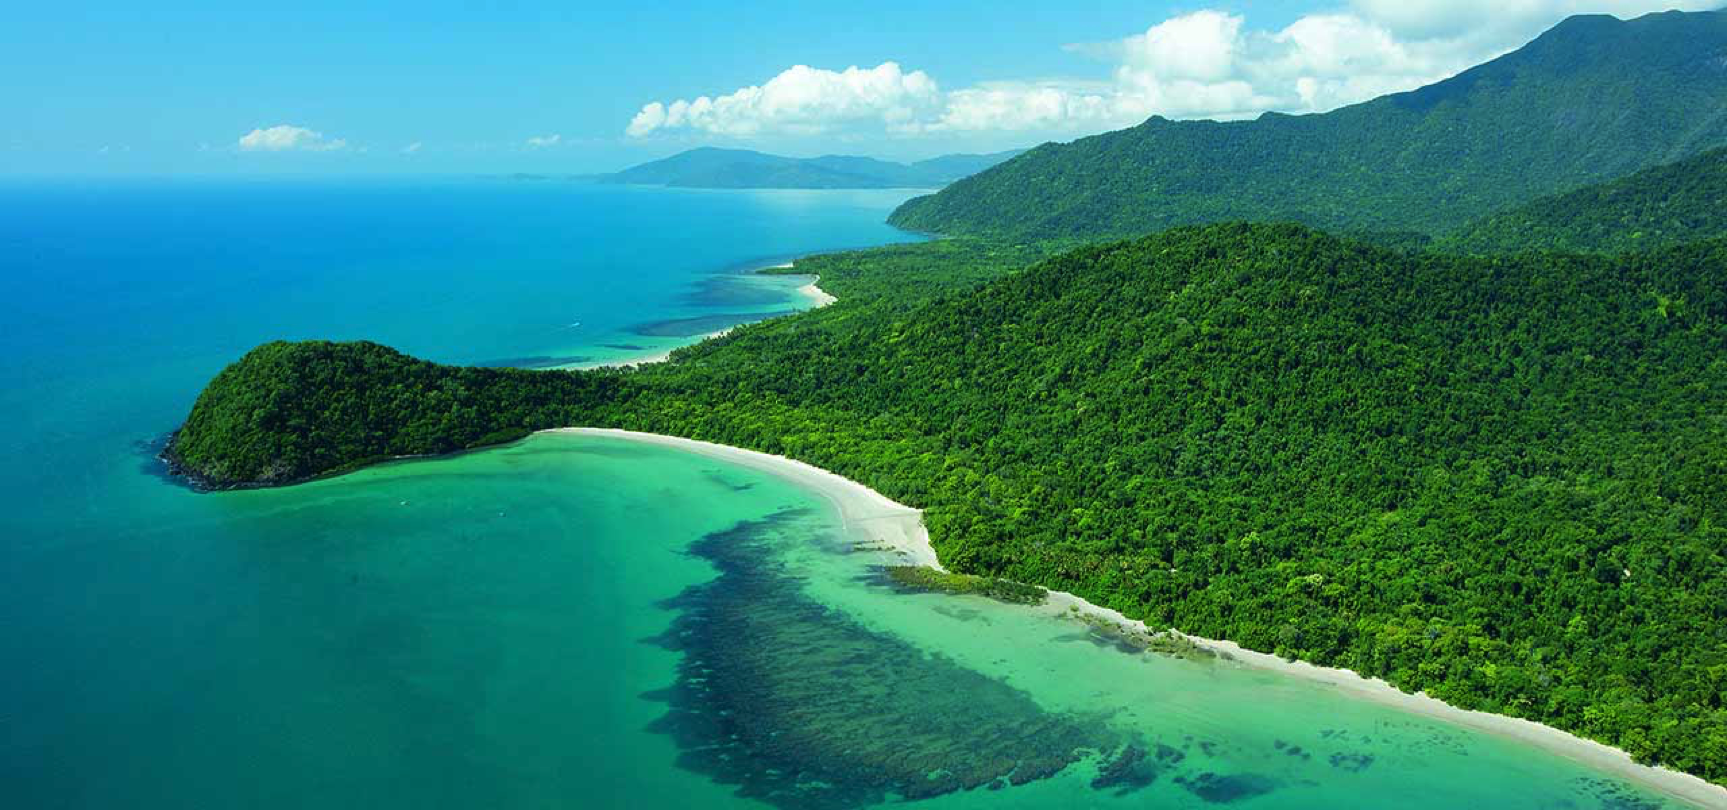 The film is set between Melbourne, Port Douglas & Cape Tribulation in Far North Queensland